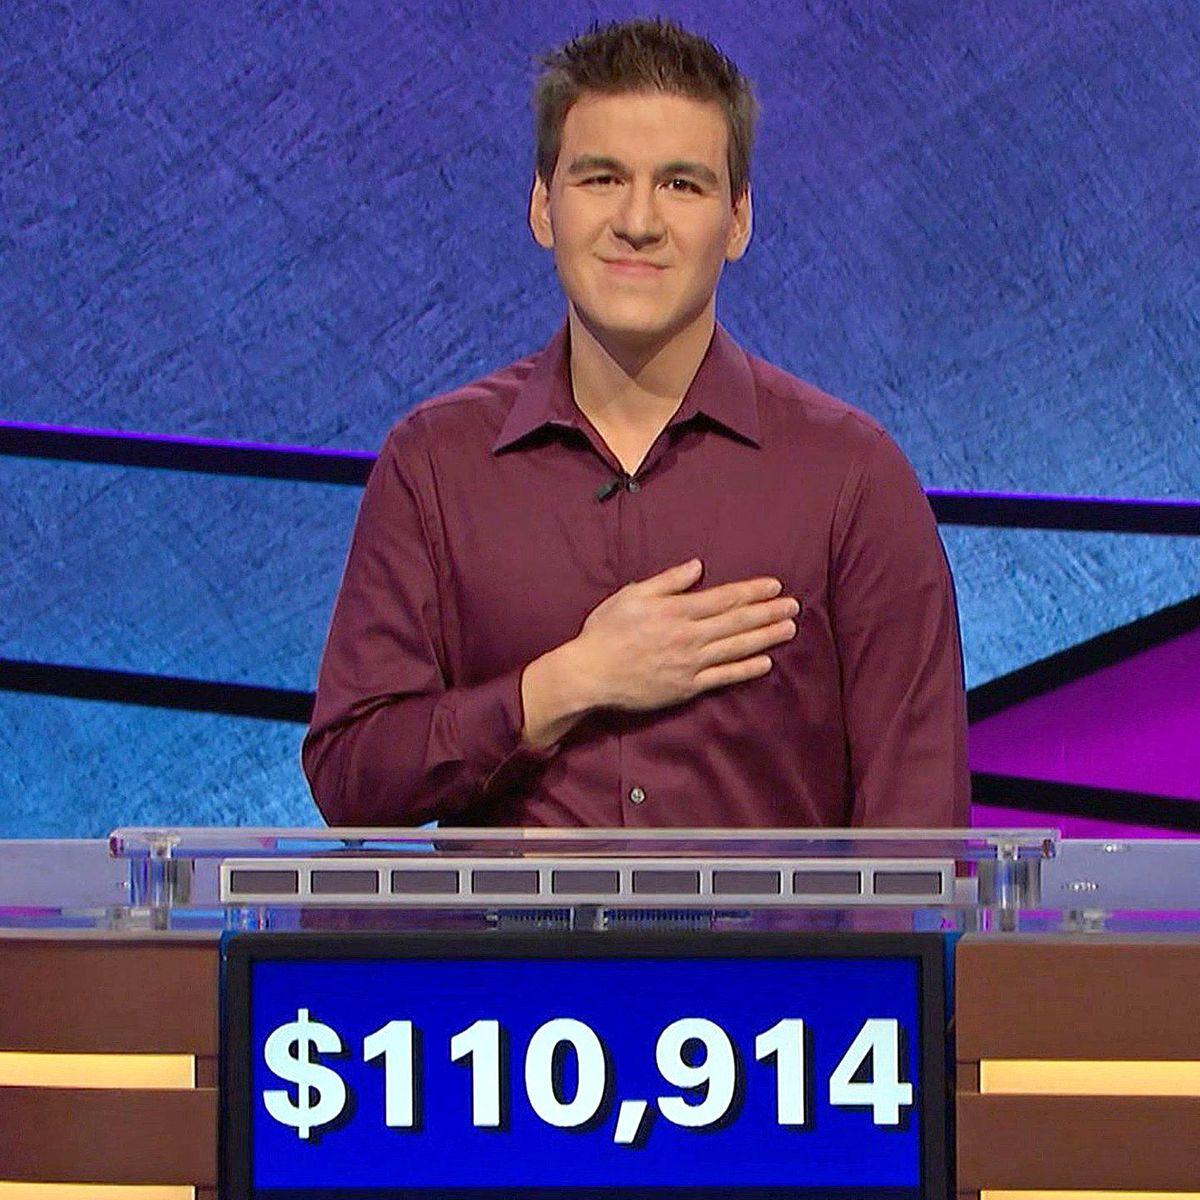 Jeopardy sports better betting shop locations uk athletics